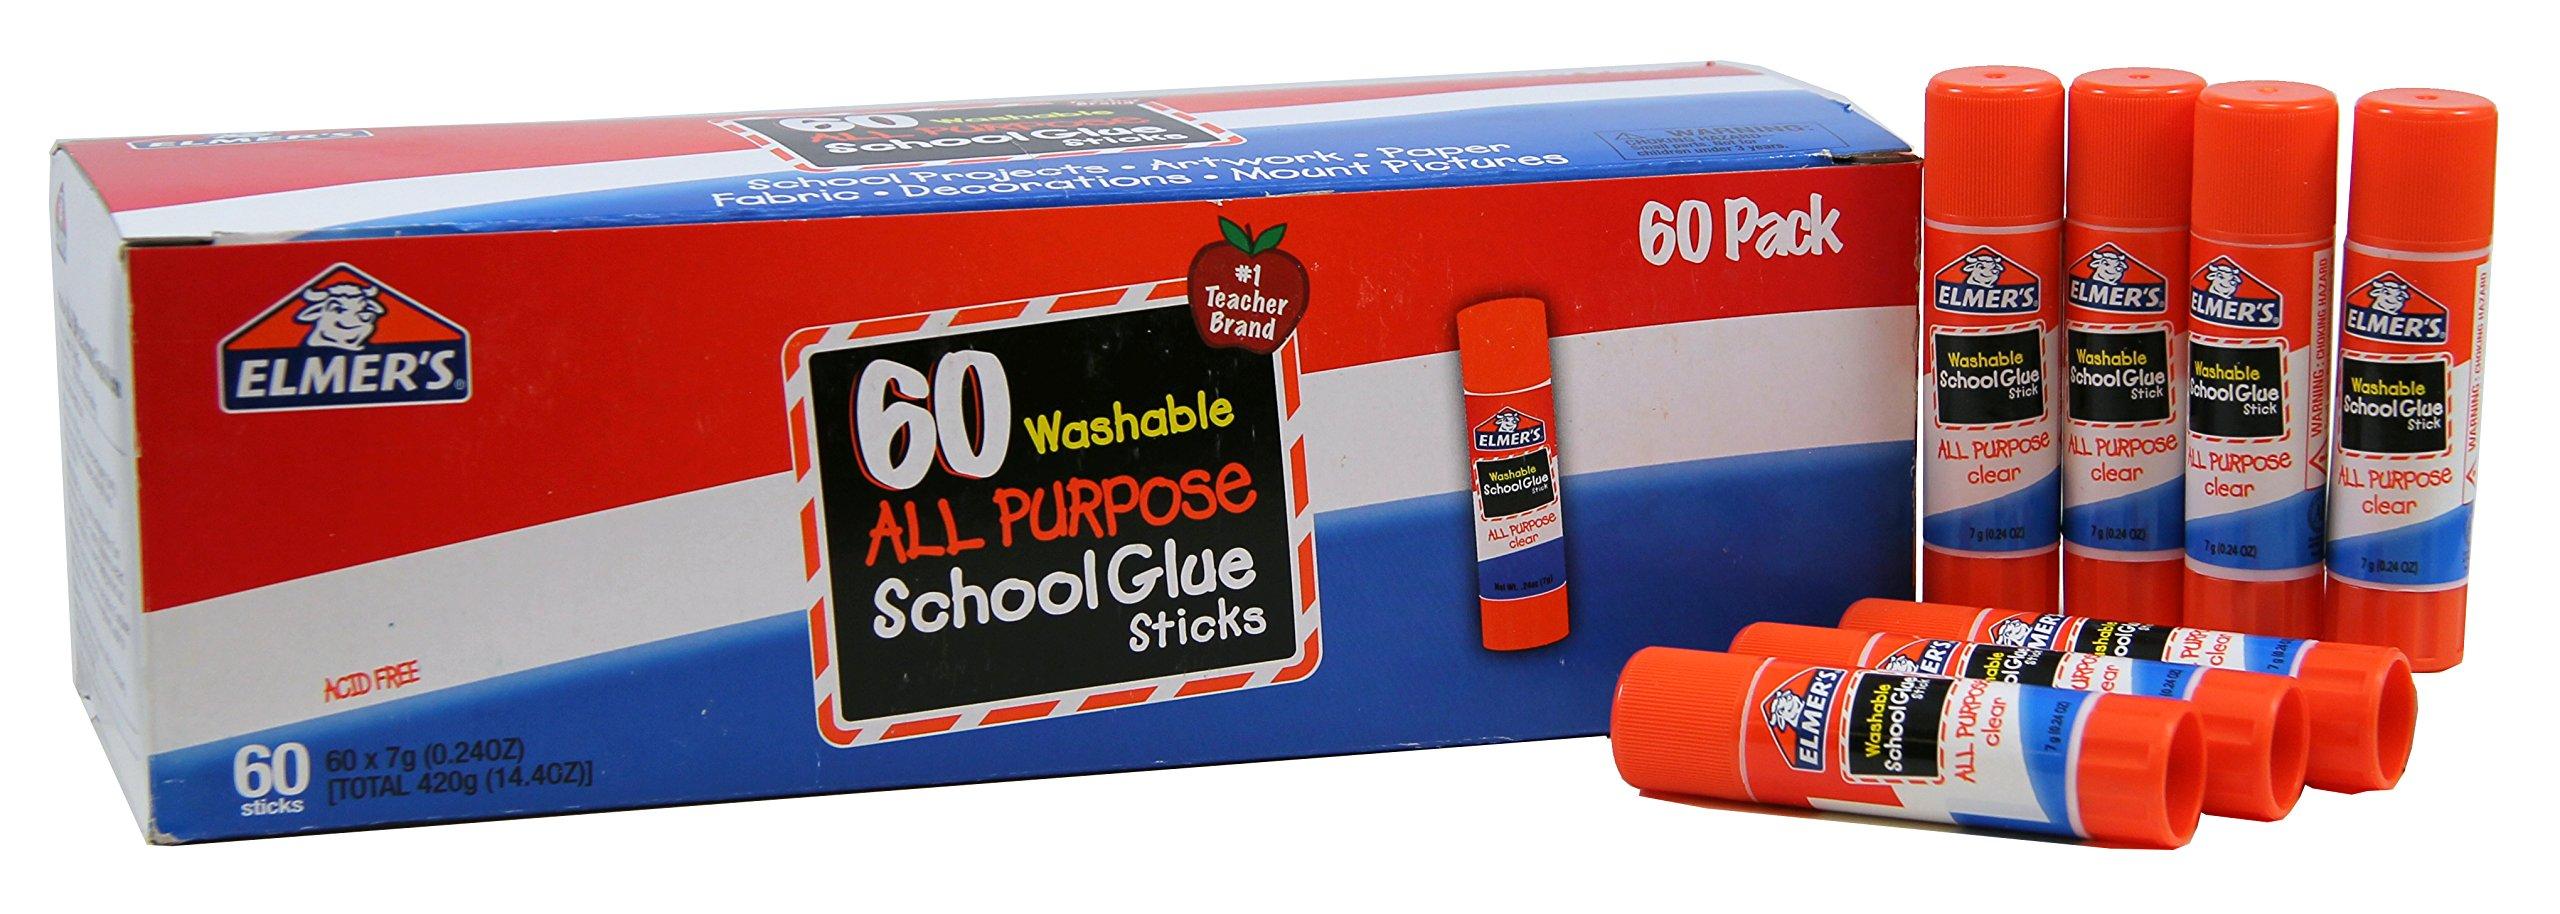 Elmer's All Purpose School Glue Sticks, Washable, 60 Pack, 0.24-ounce sticks by Elmer's (Image #5)